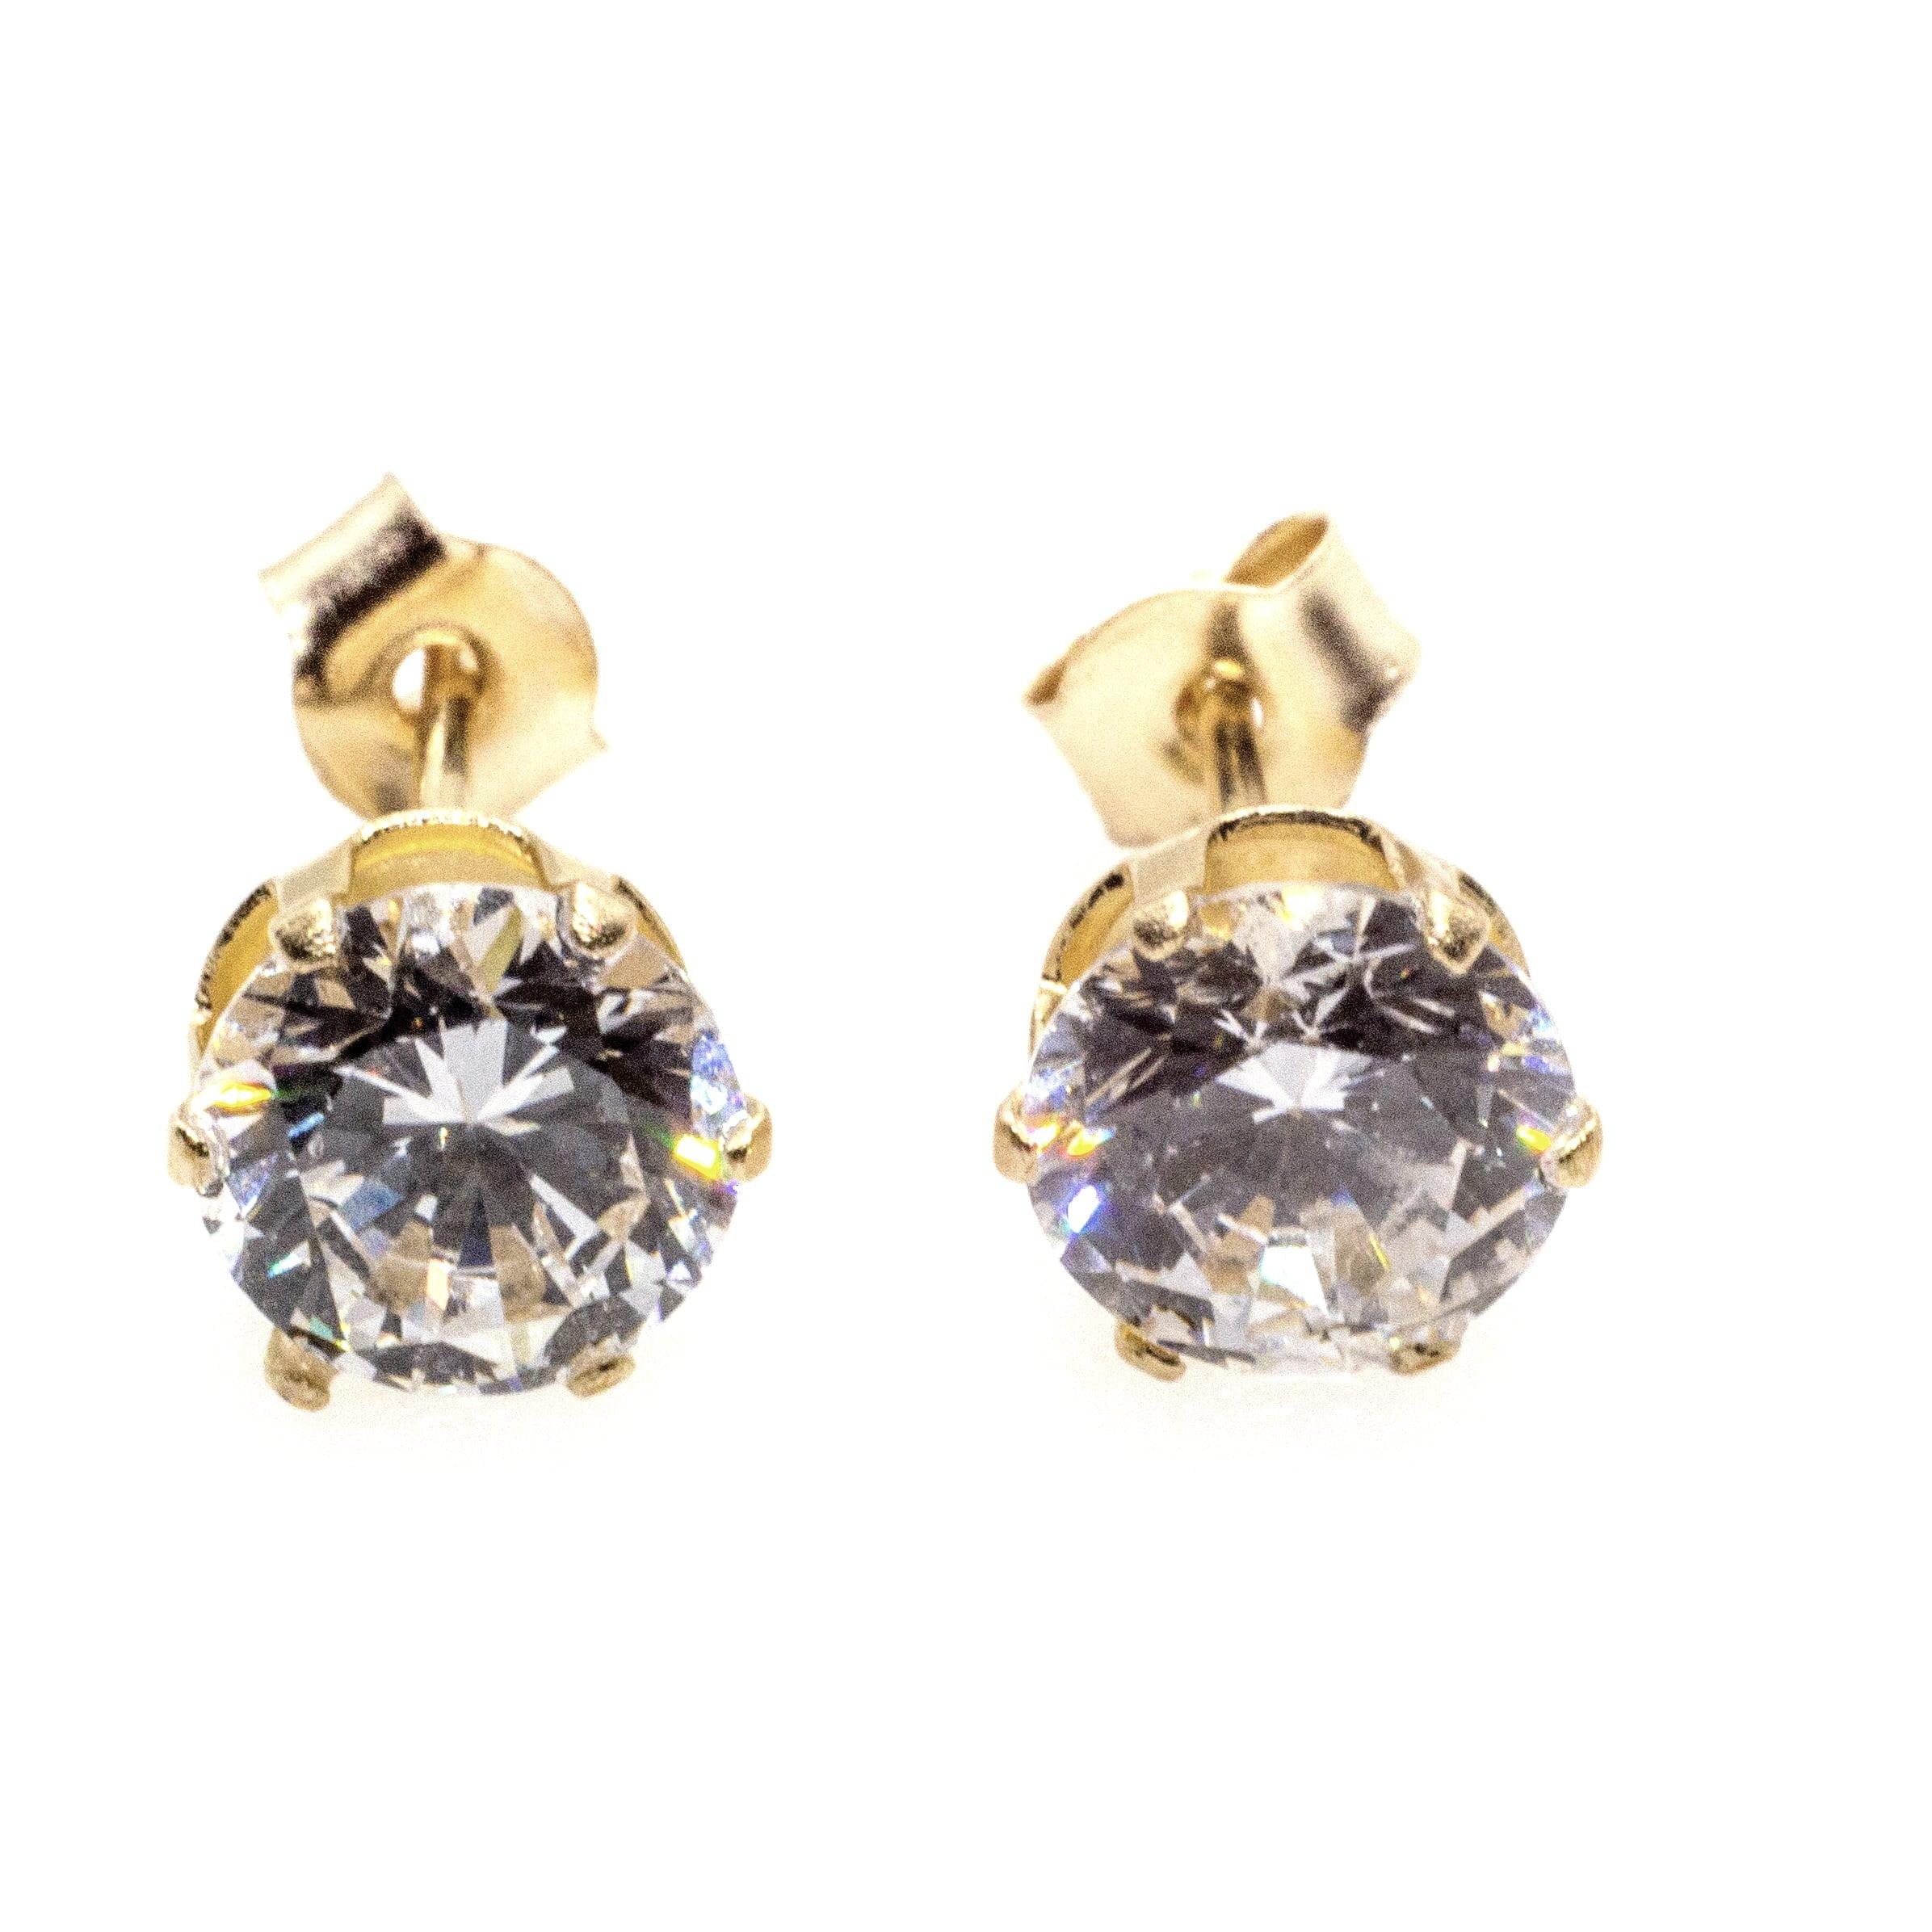 5mm CZ stud earrings 9ct yellow gold alt 1